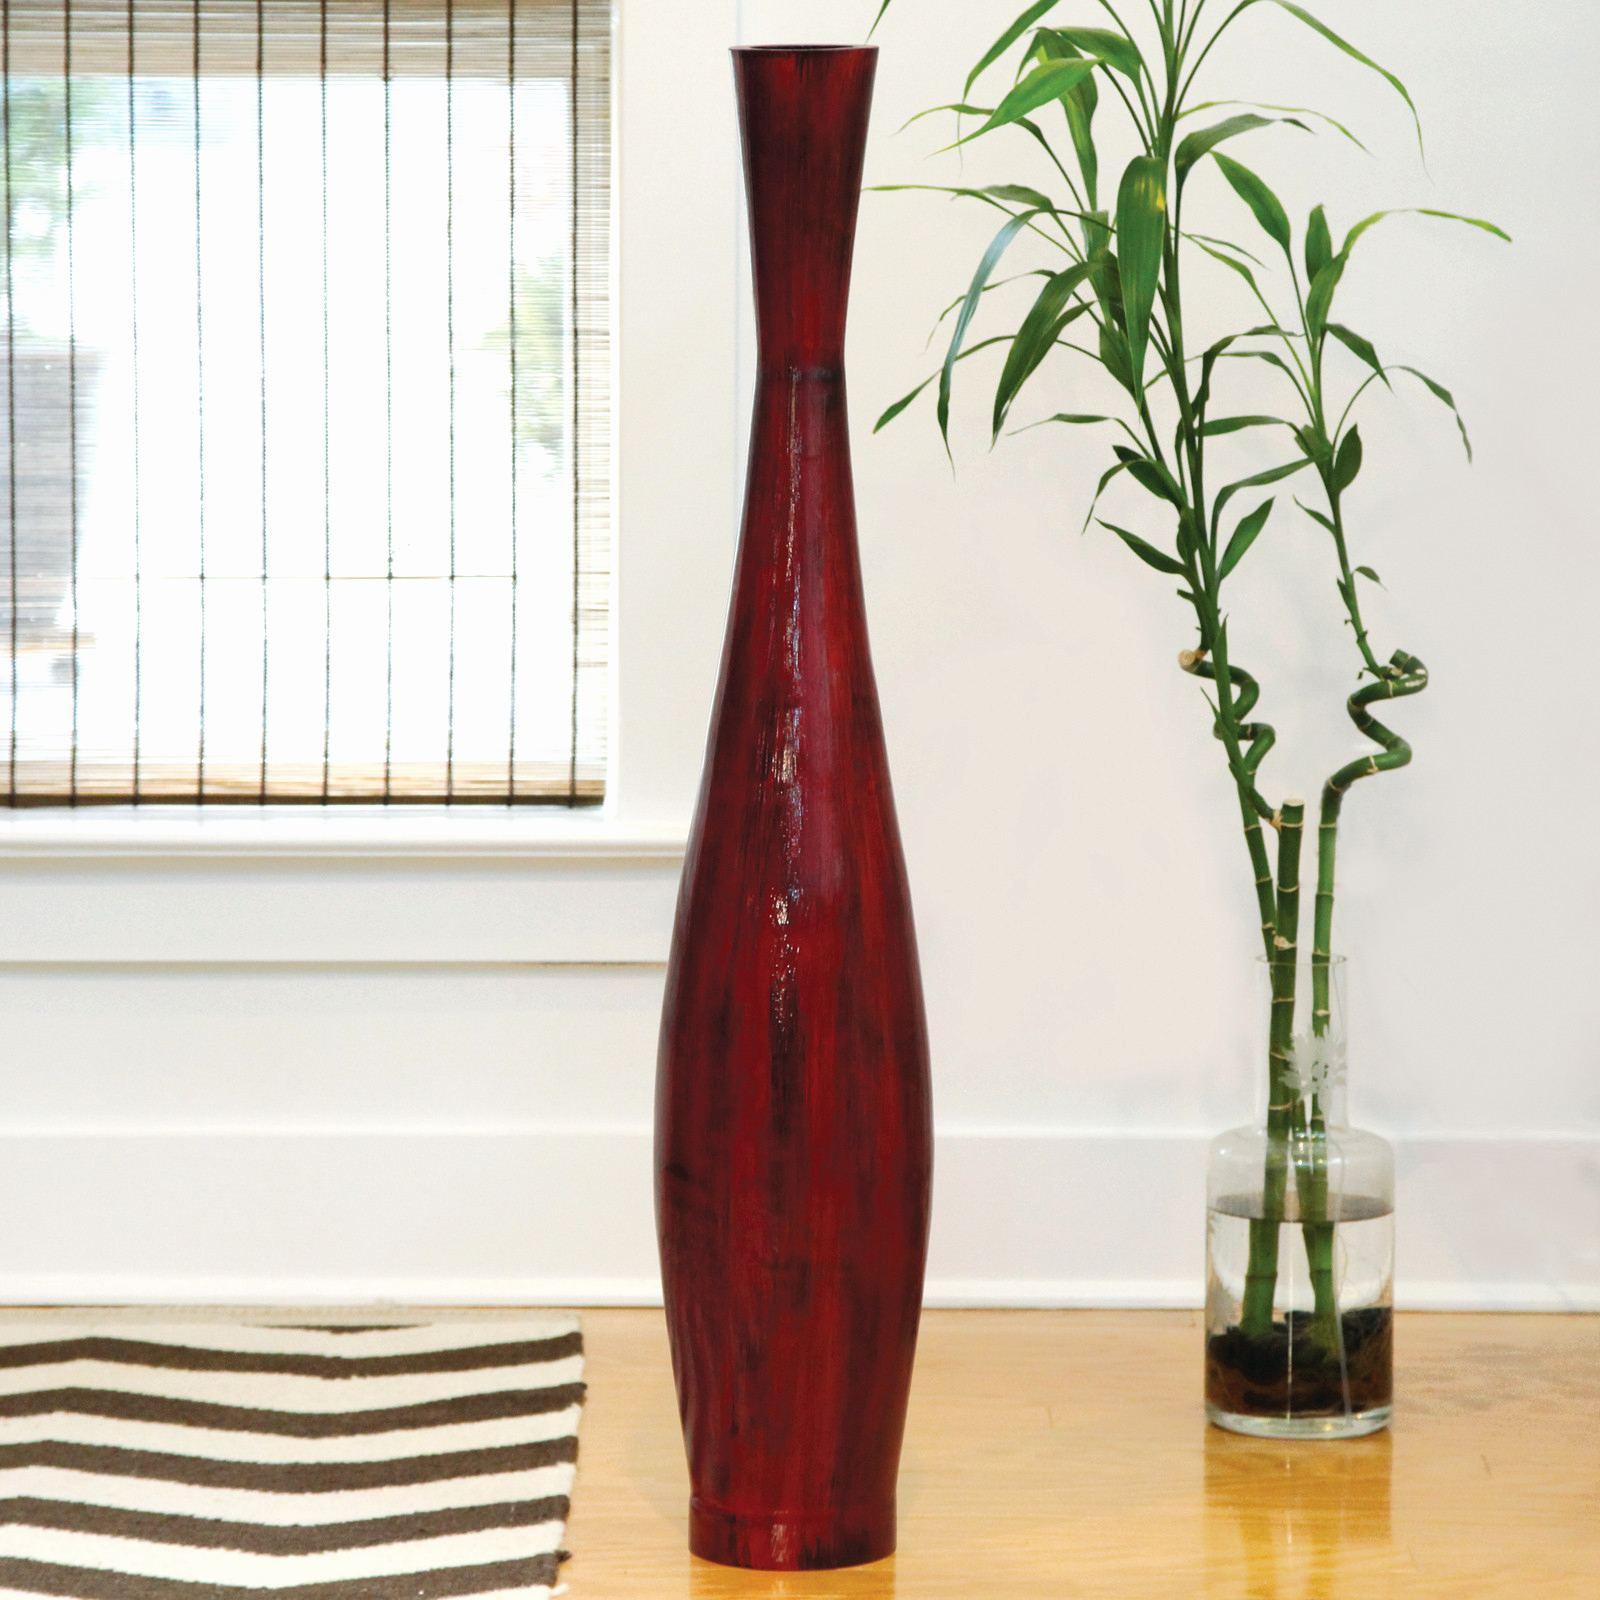 tall floor vases ikea of mirrored floor vase gallery ikea krabb mirror ideas best pe s5h intended for ikea krabb mirror ideas best pe s5h vases ikea floor vase i 0d